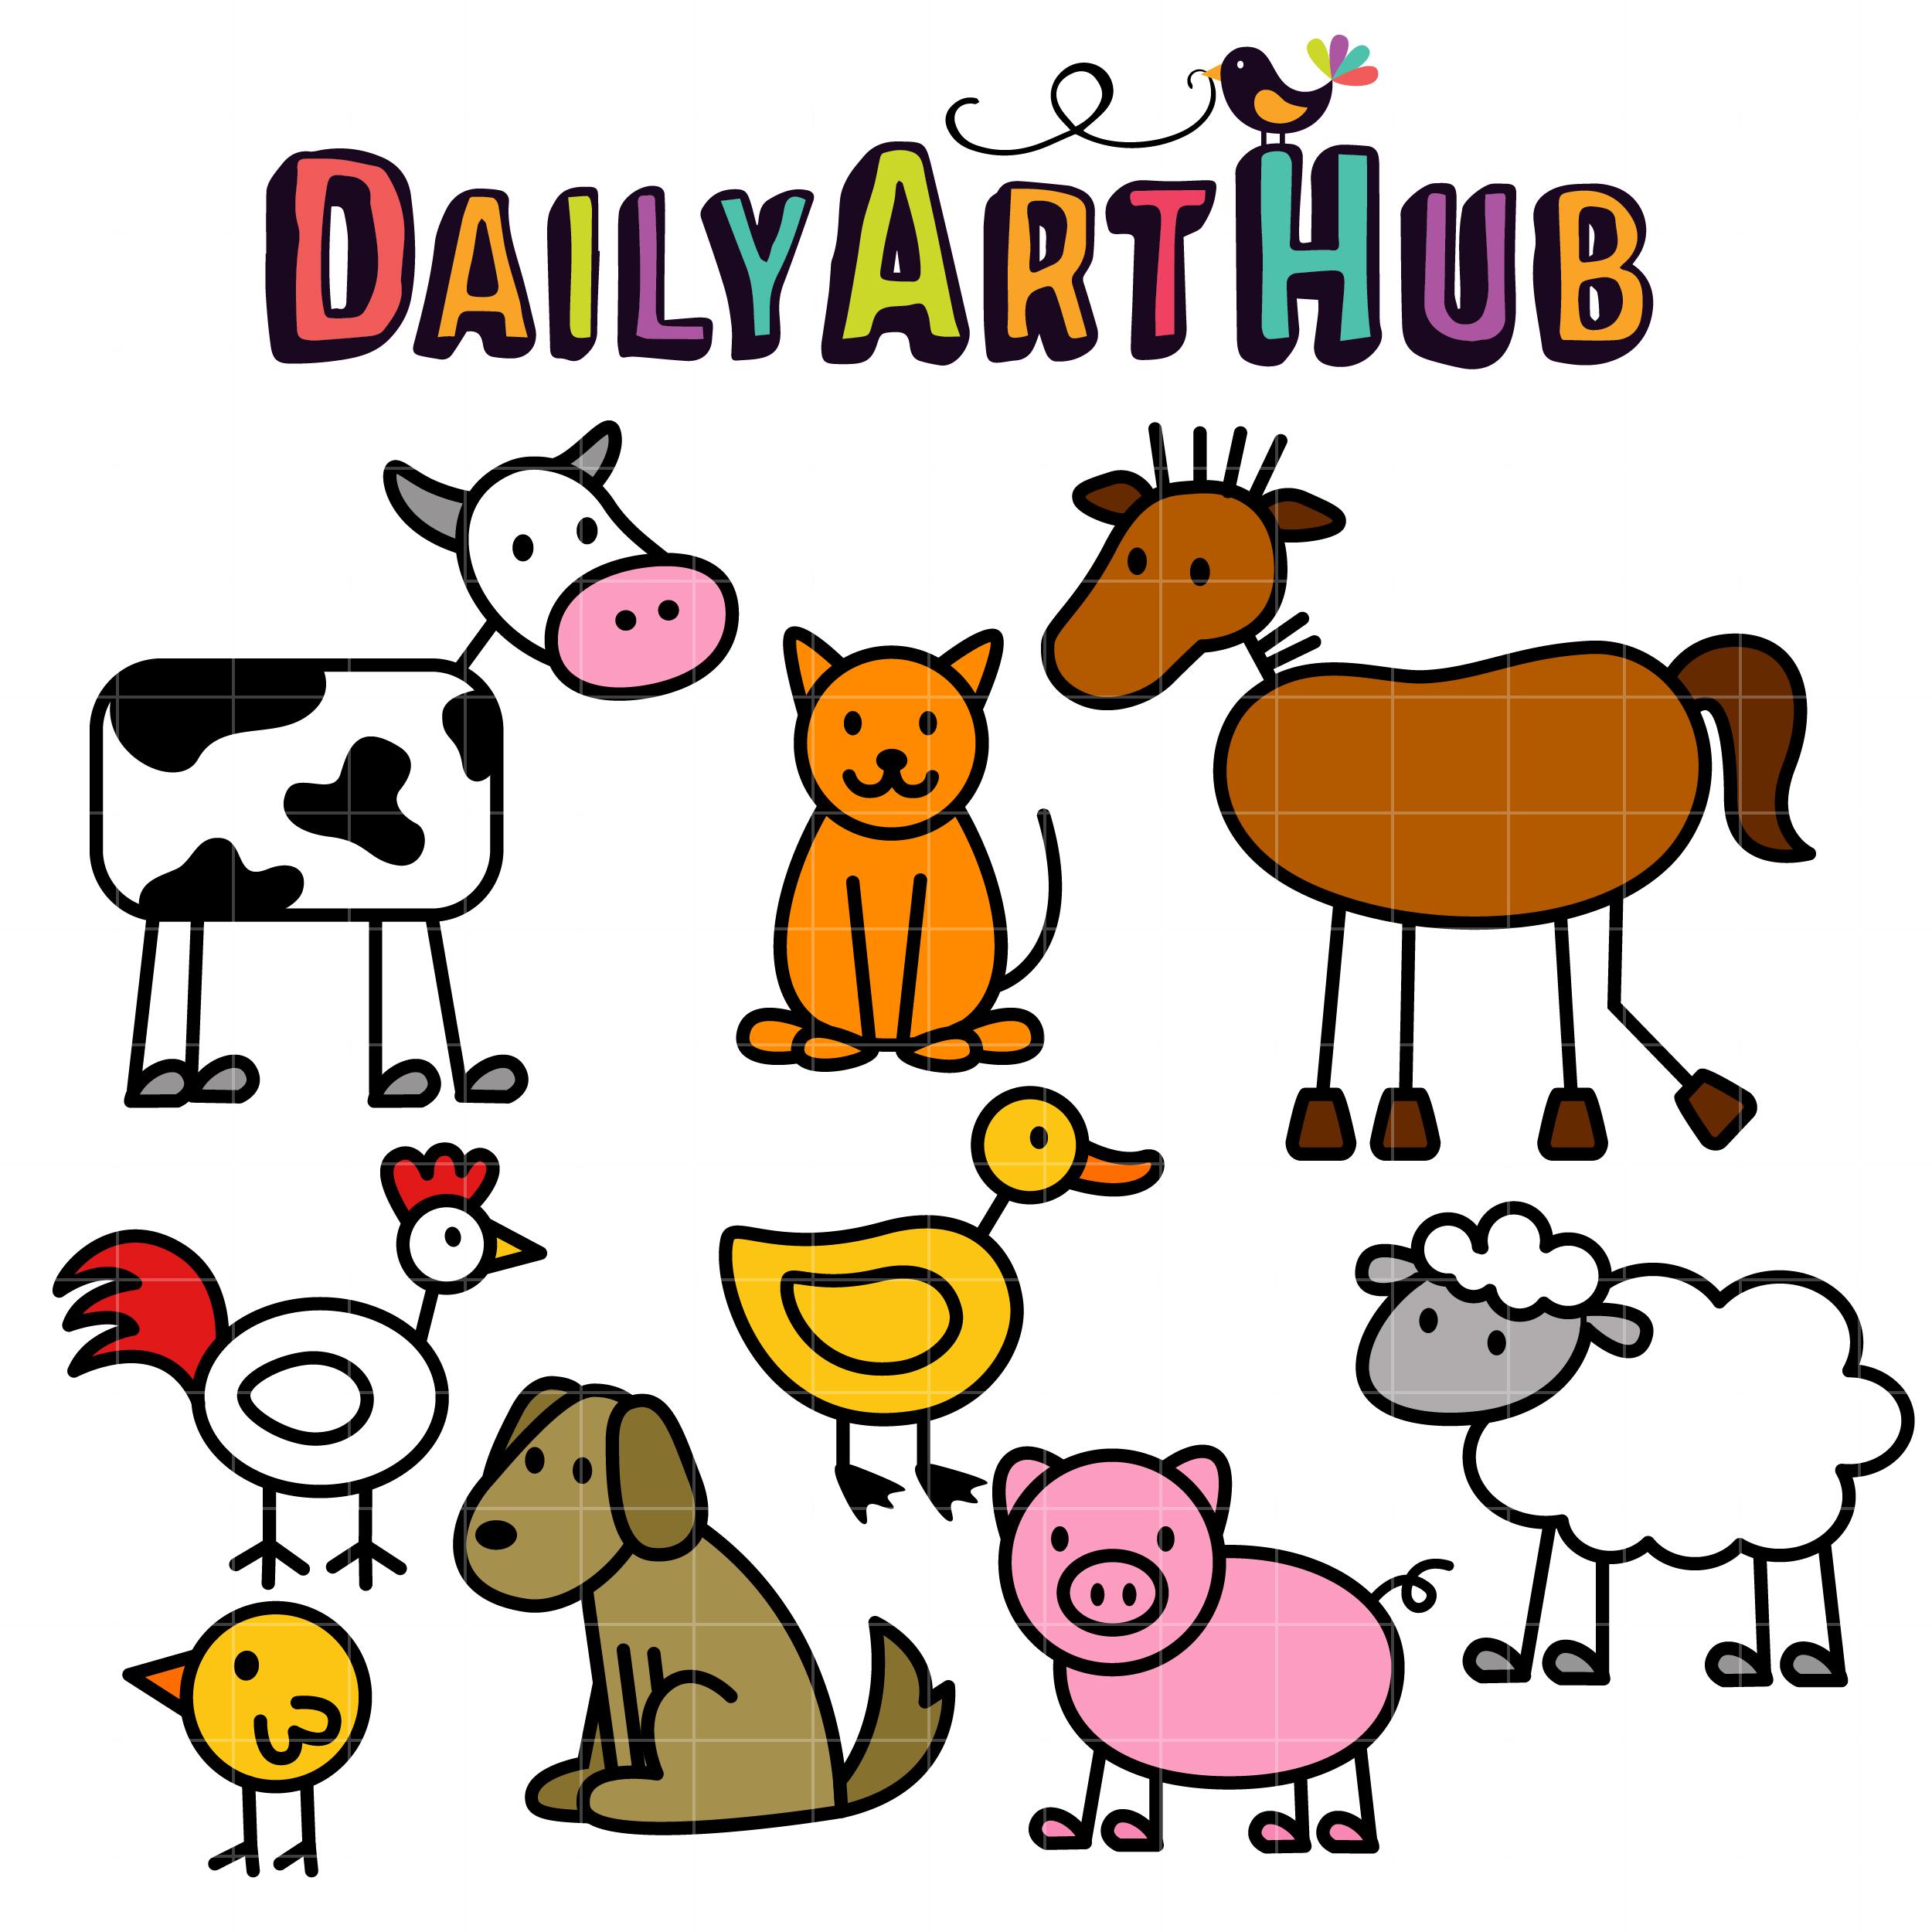 free farm animal clipart at getdrawings com free for personal use rh getdrawings com farm animal clipart for teachers farm animals clip art images